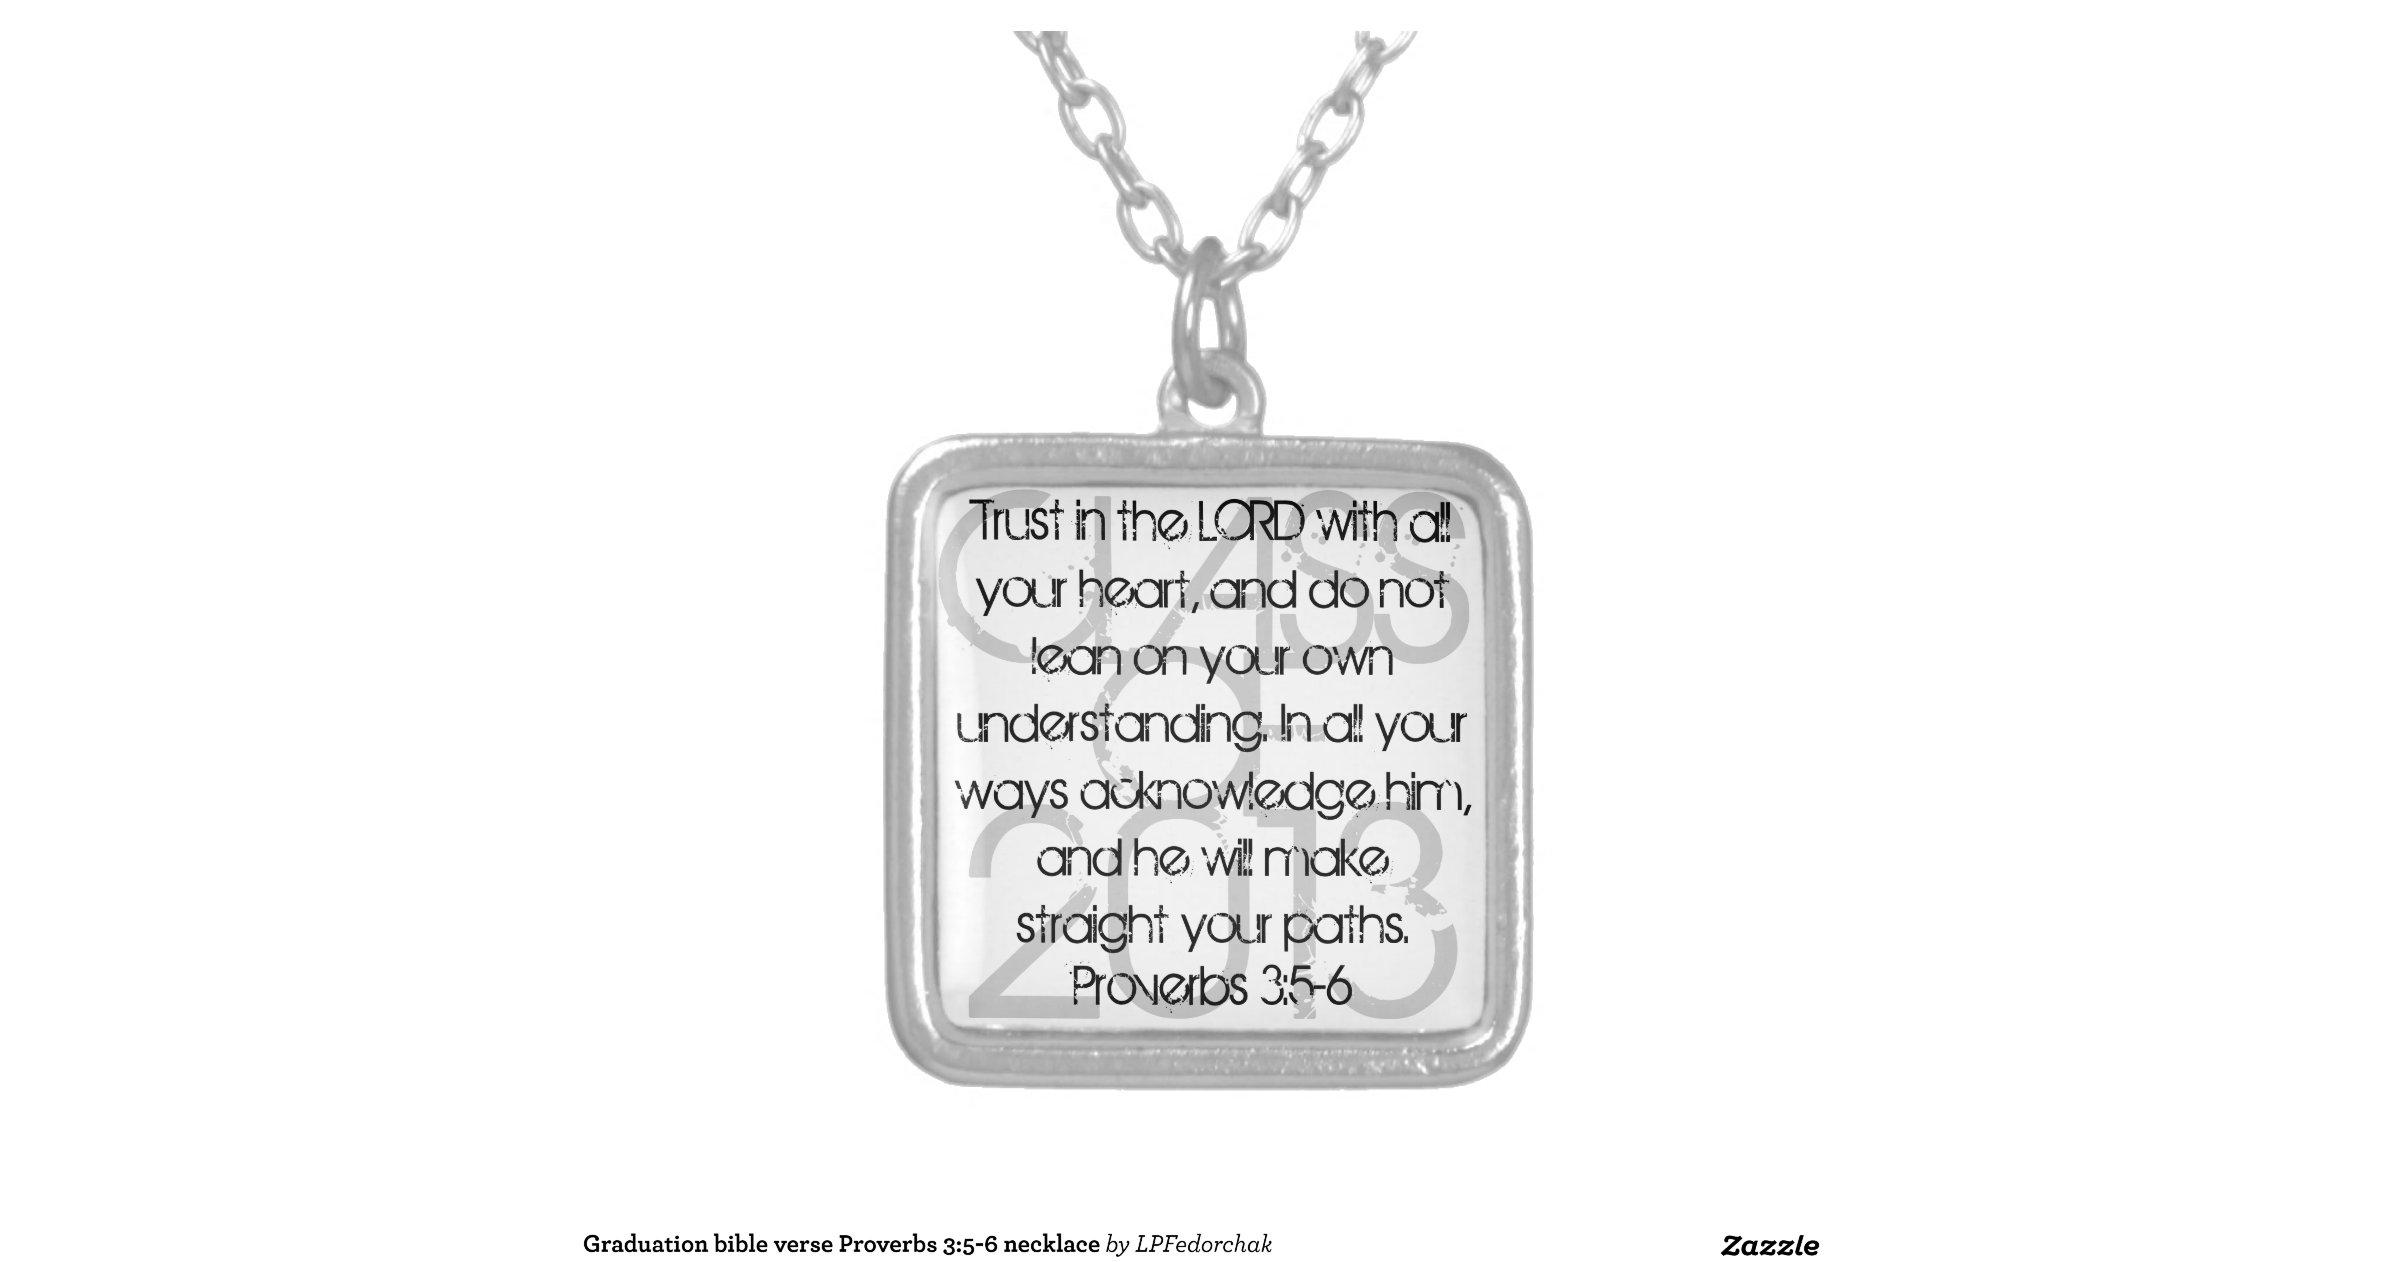 graduation_bible_verse_proverbs_3_5_6_necklace